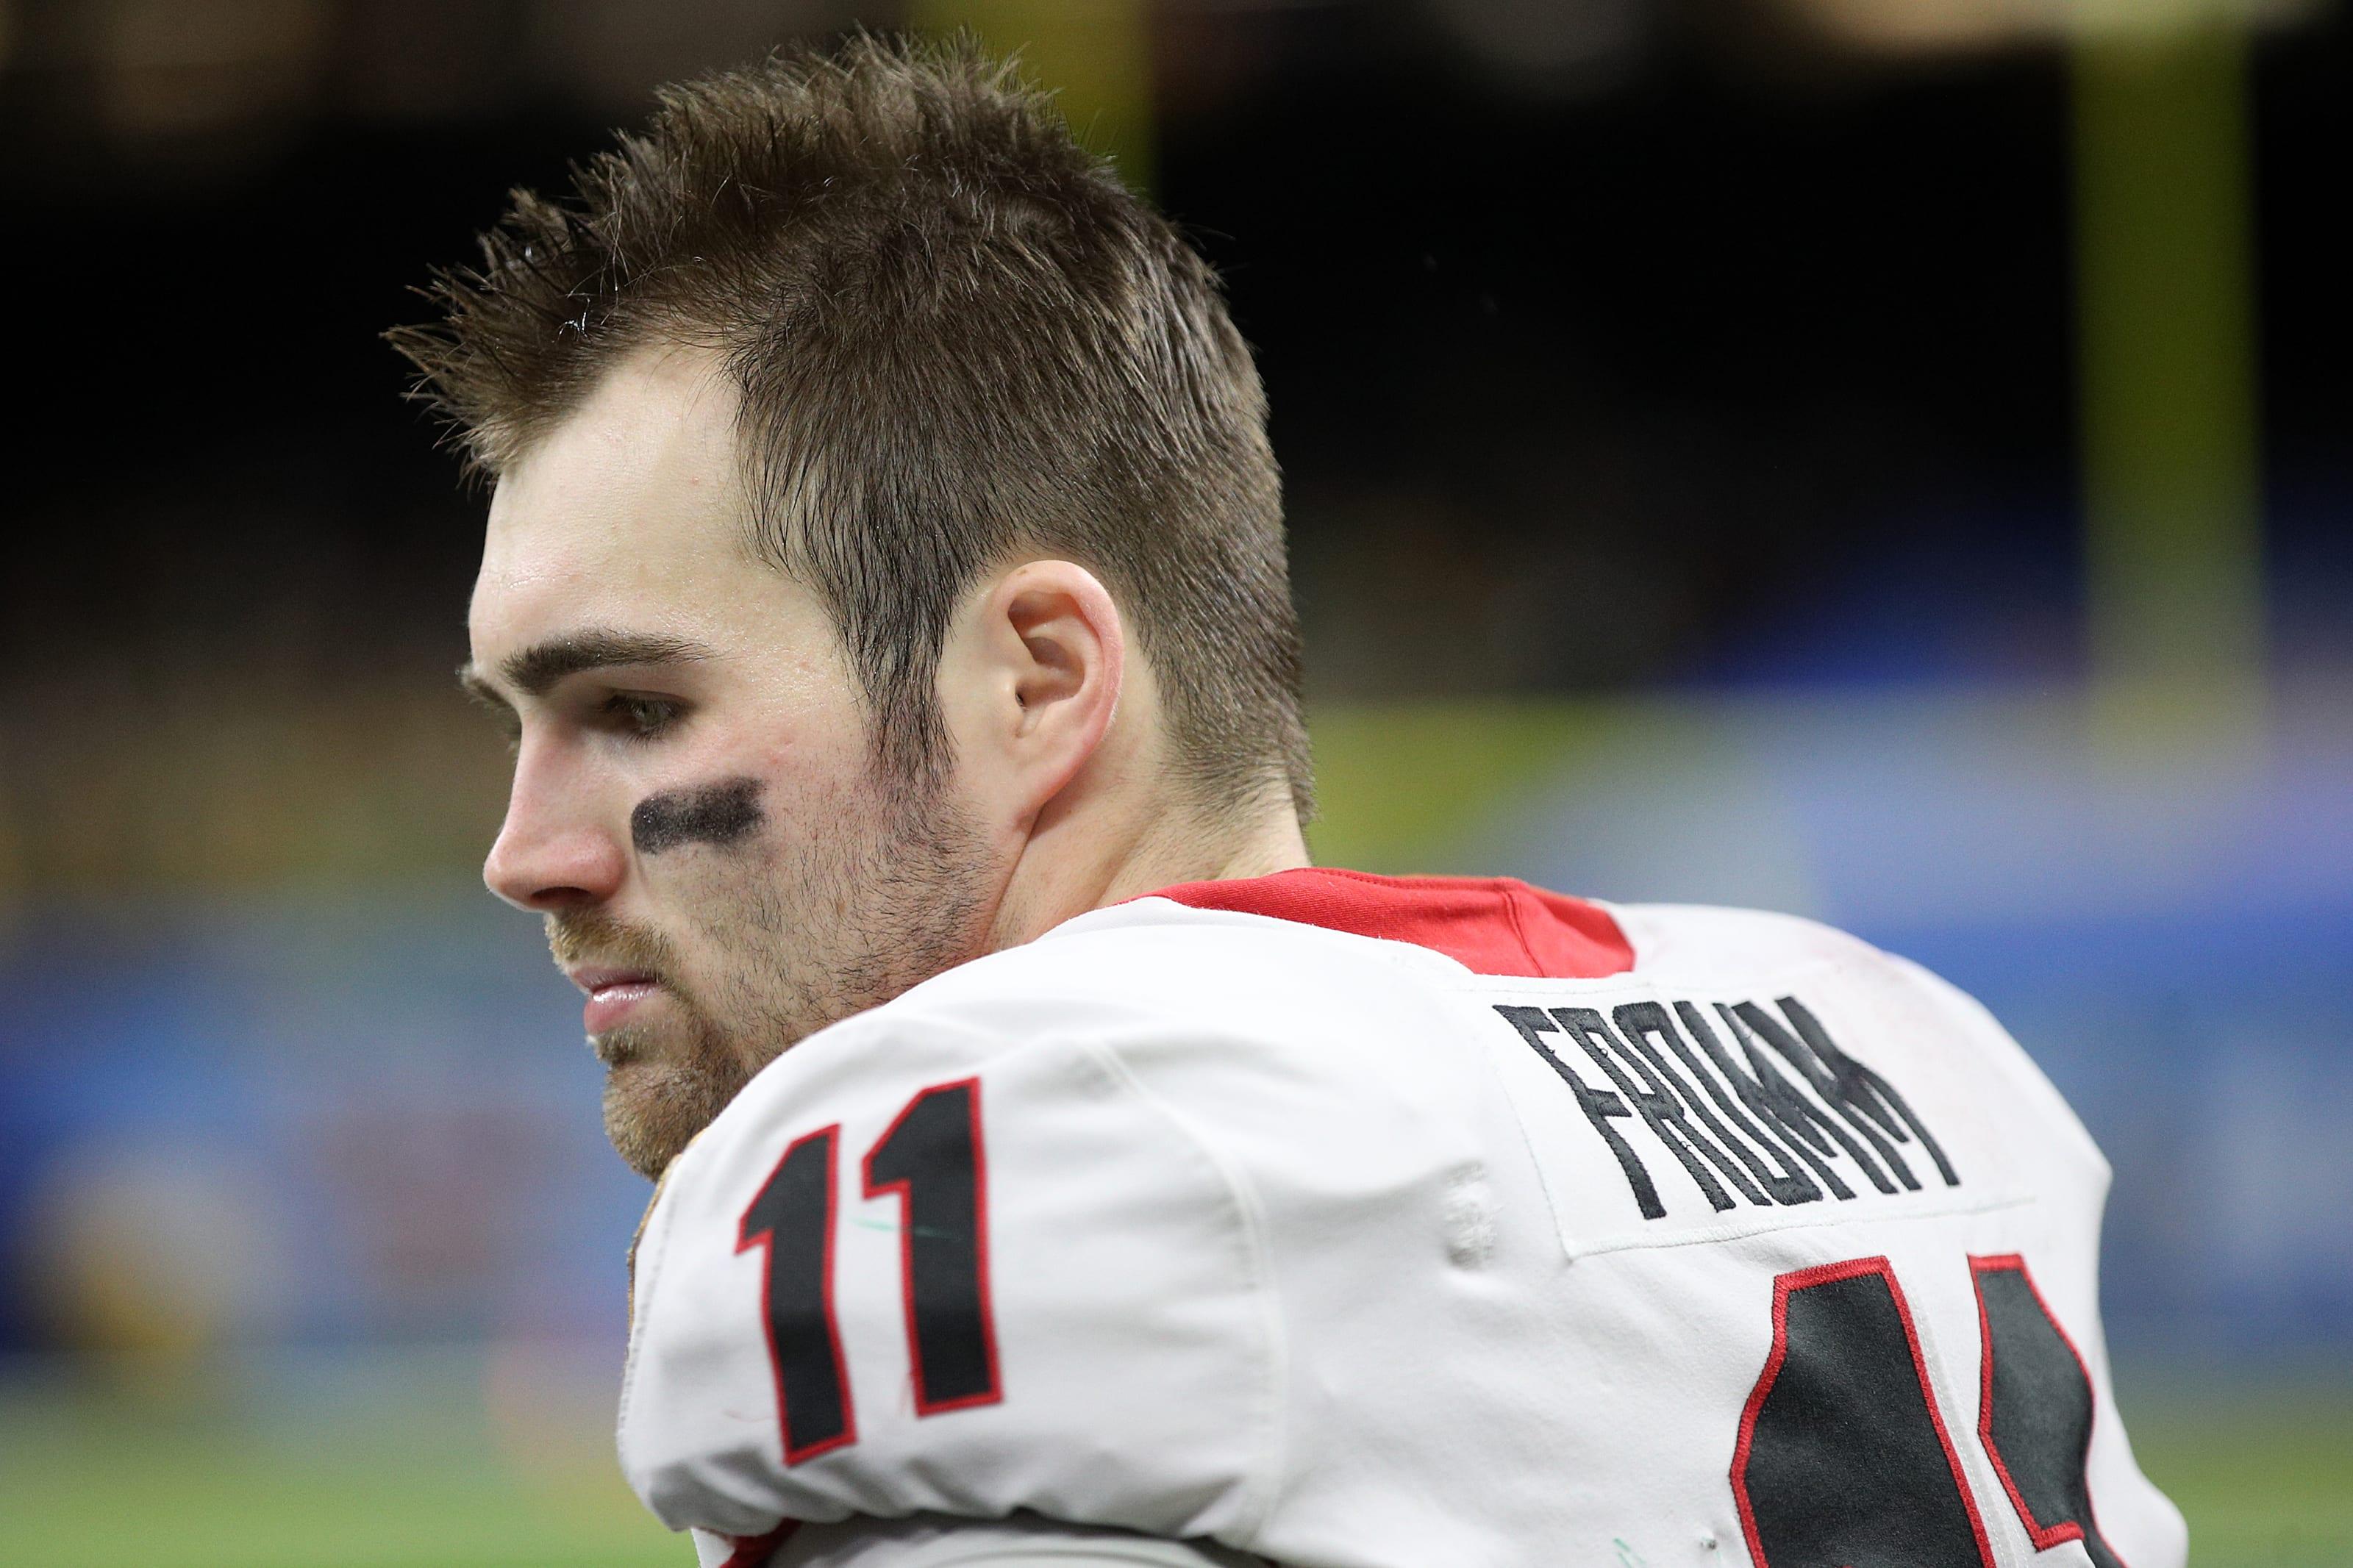 2020 NFL Draft Jake Fromm